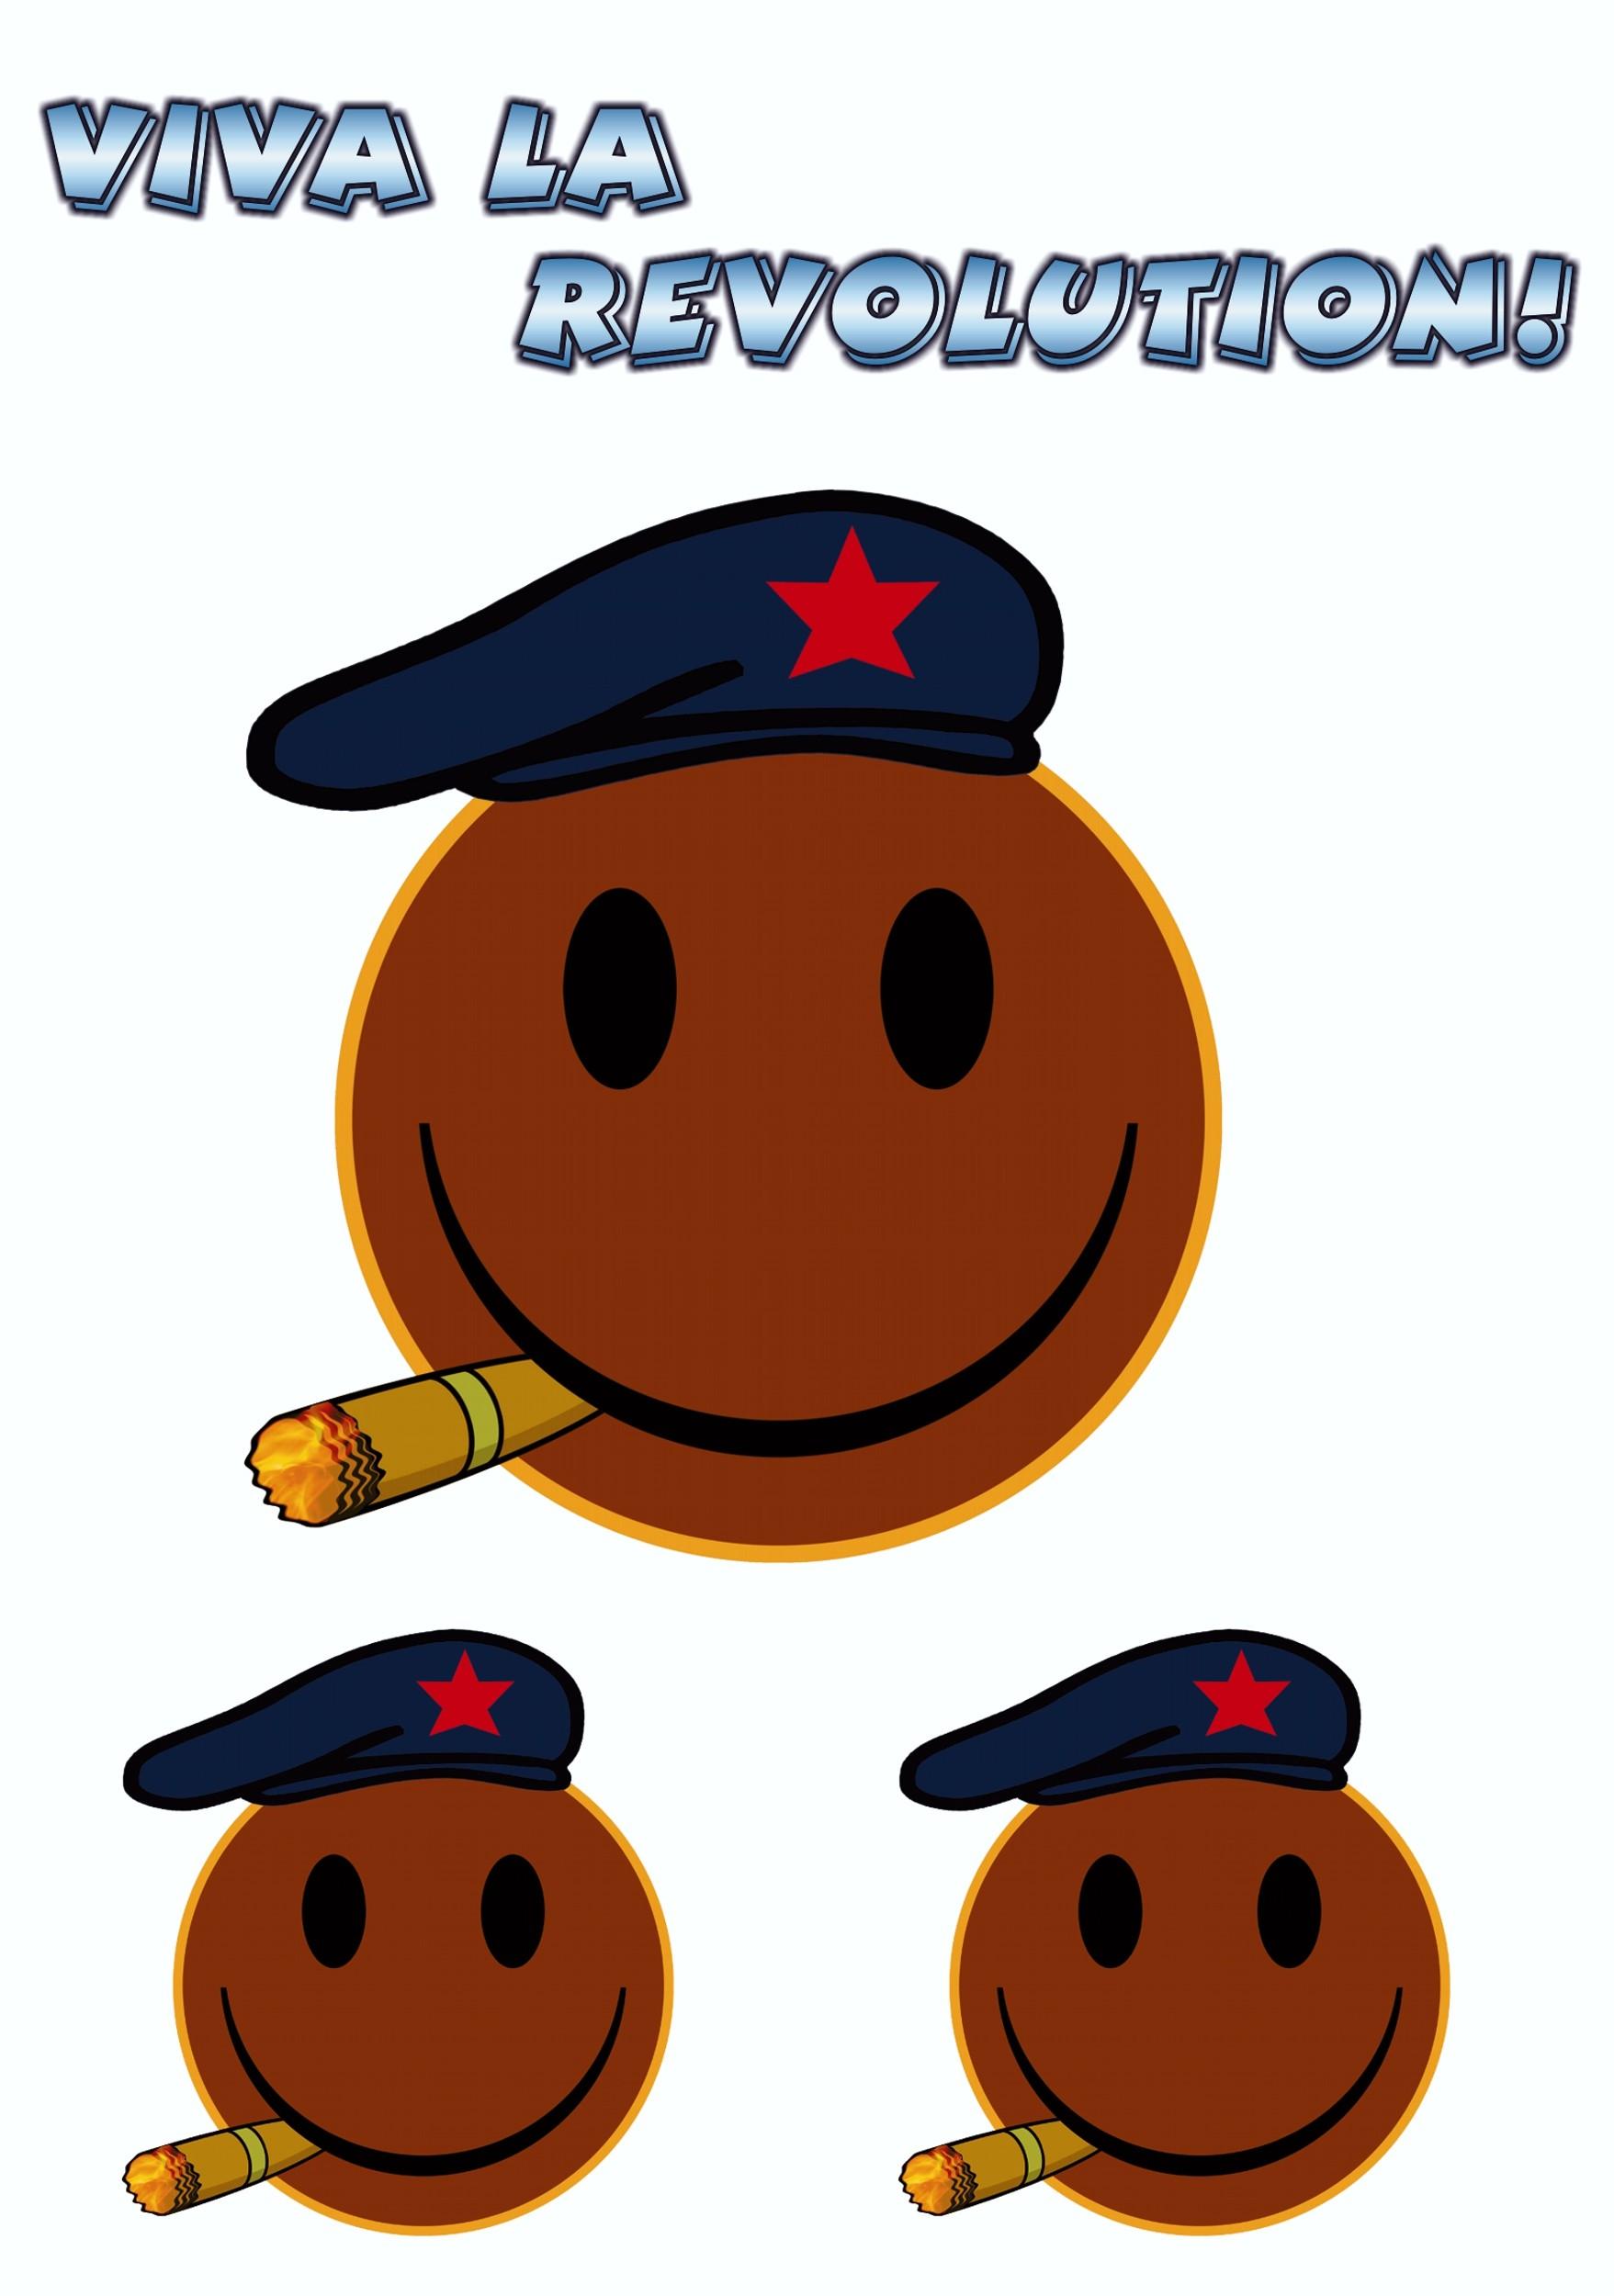 Aufkleber Smily Viva La Revolution! 3er-Set 150 x 105 mm – Bild 1